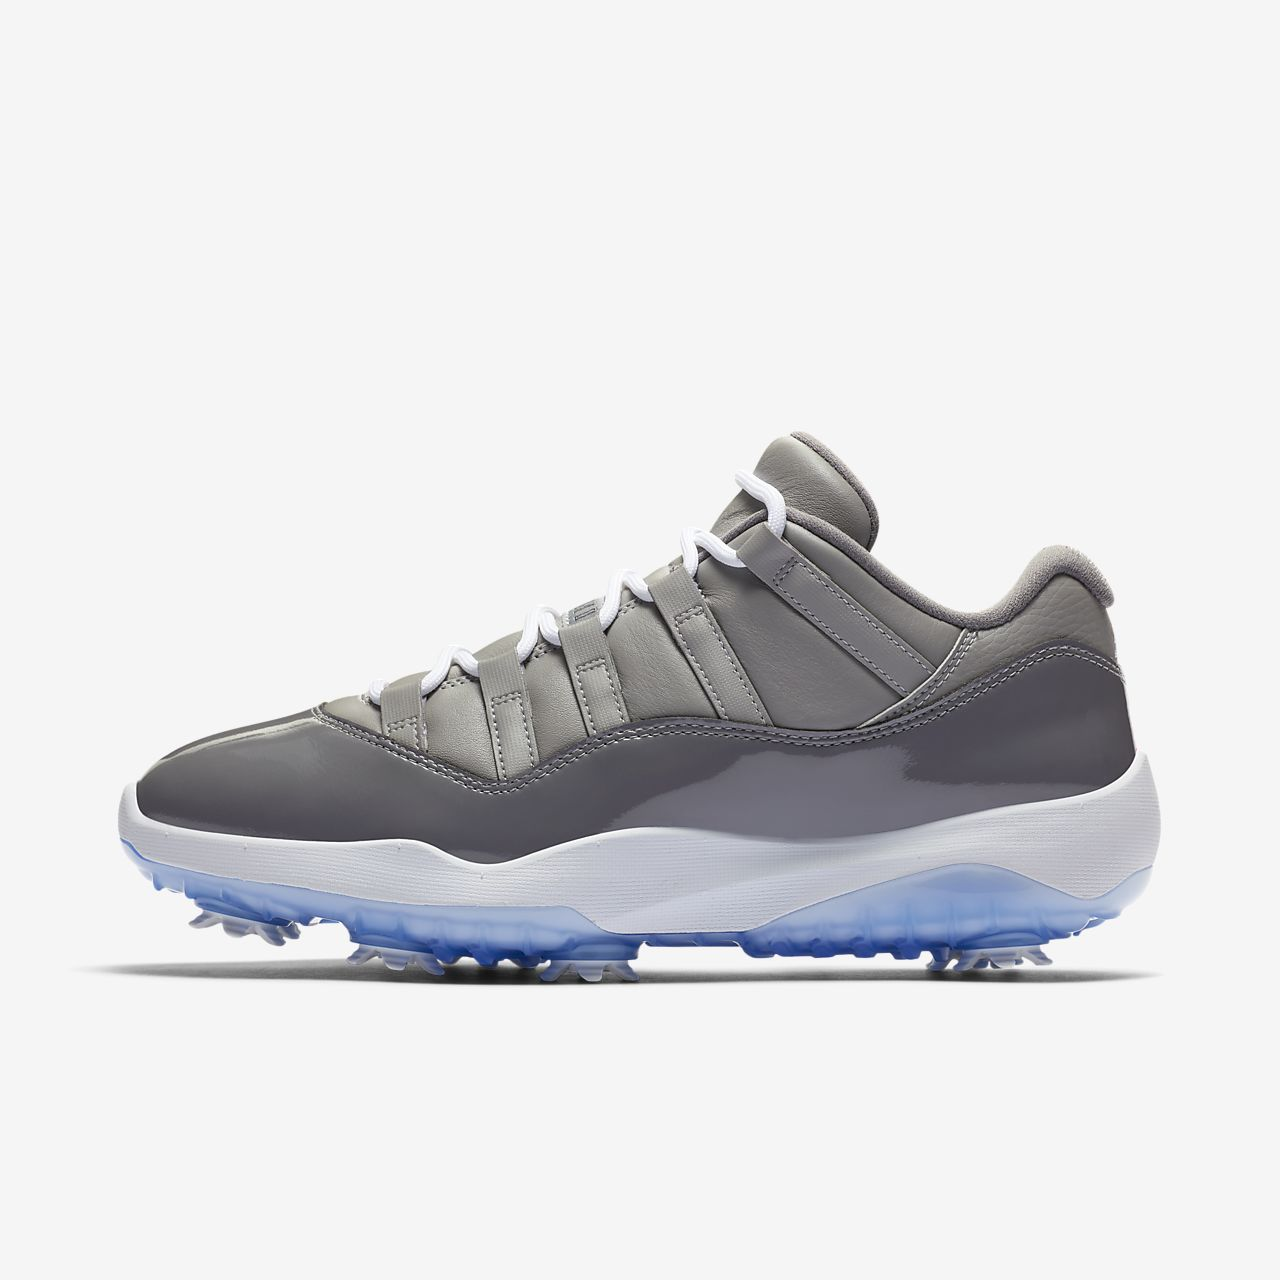 Jordan XI Golf 男子高尔夫球鞋-耐克(Nike